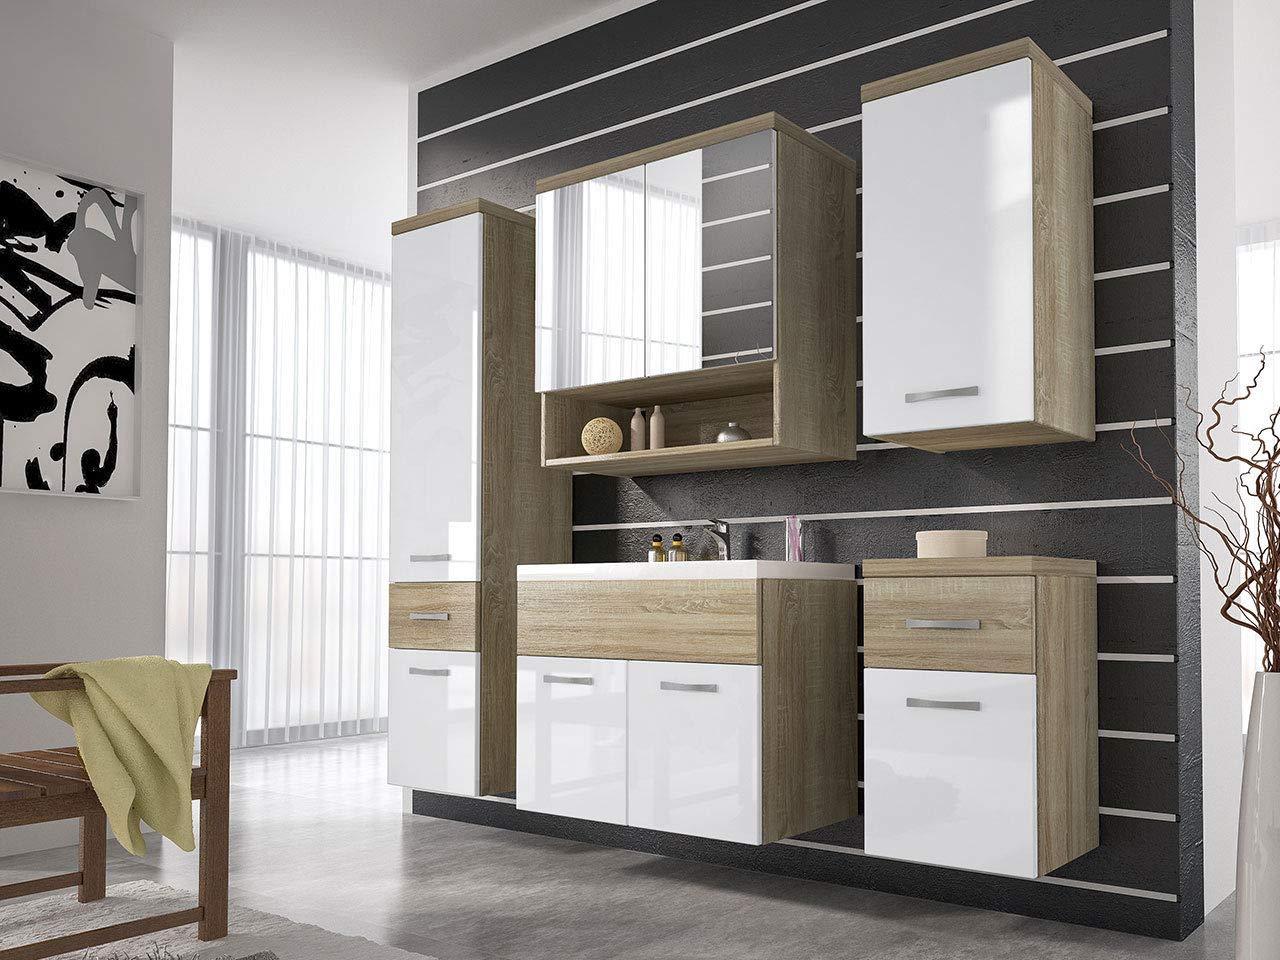 WC-Sitz SintesiBagno MADE für Ideal Standard WC ABSOLUTE KUROKAWA OVALIBSD0780